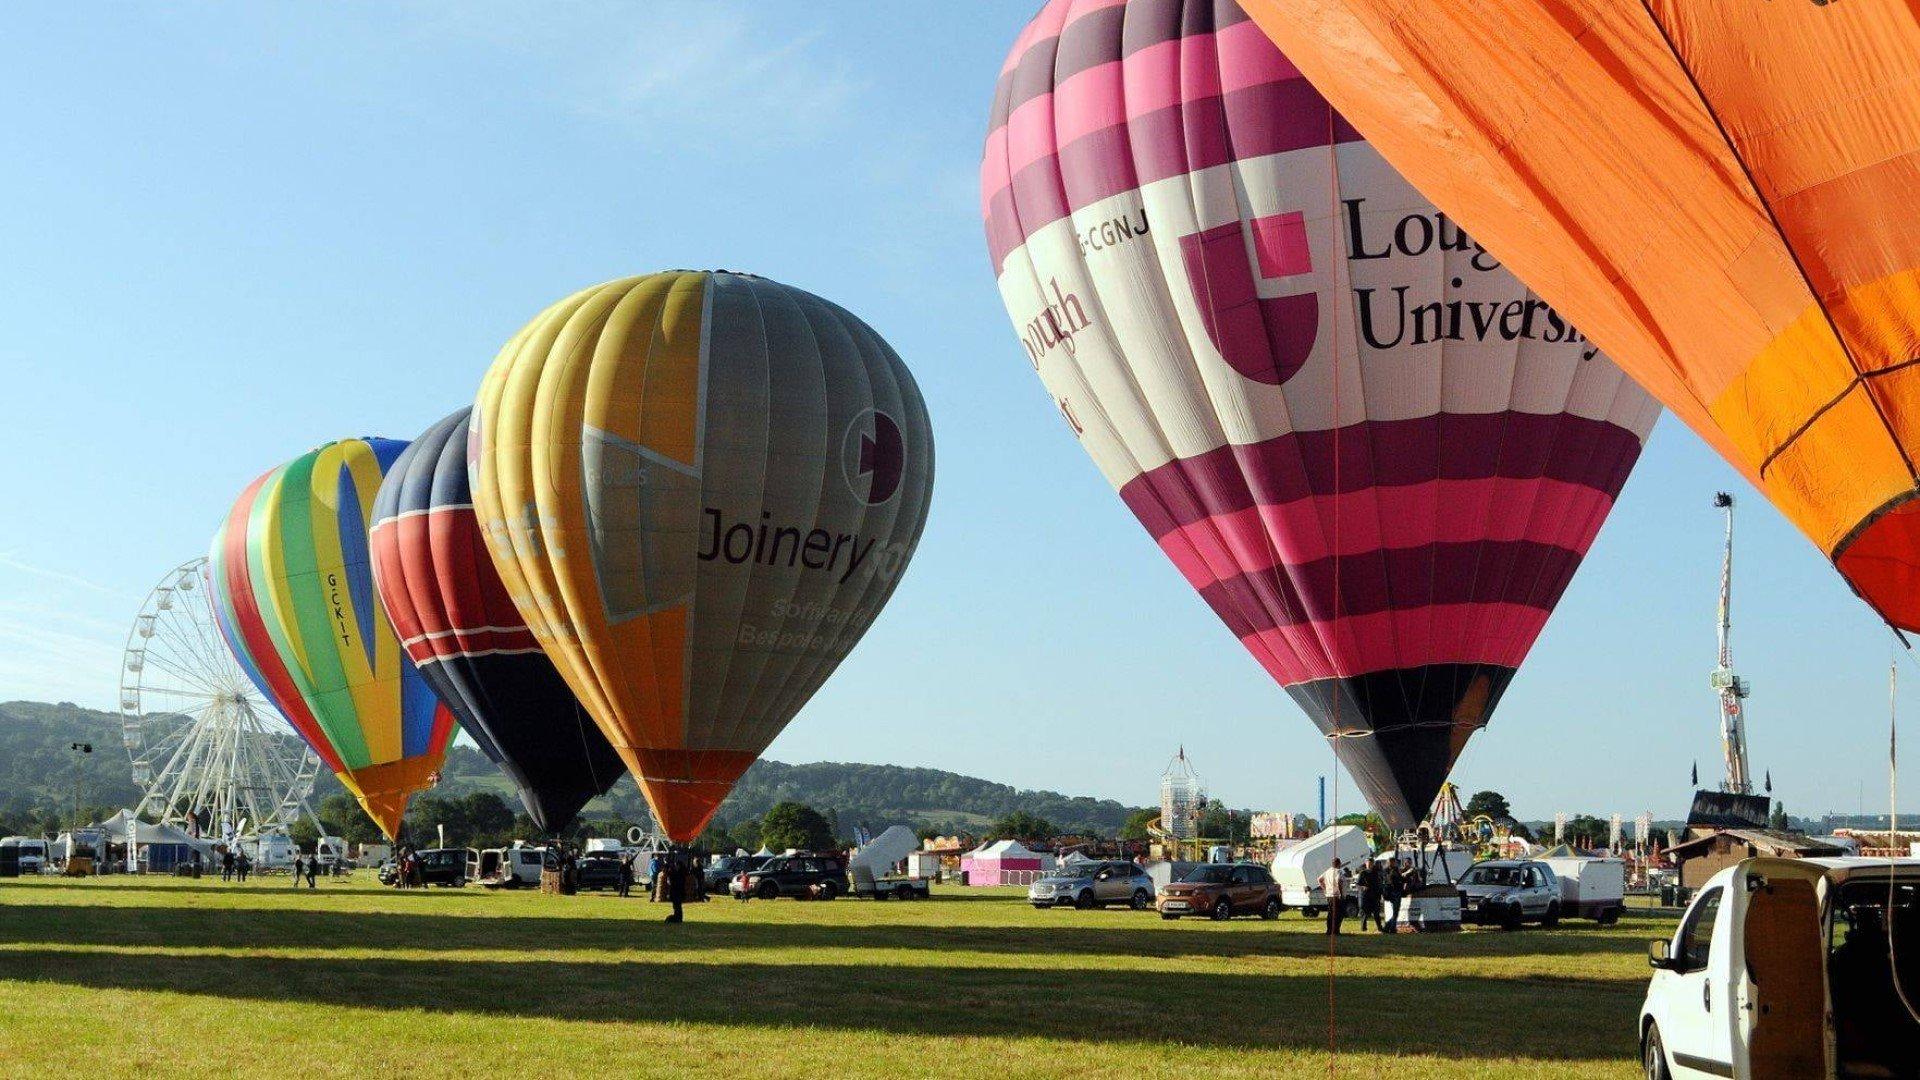 Oxford Balloon Festival 2021 - Cutteslowe Park in Oxford